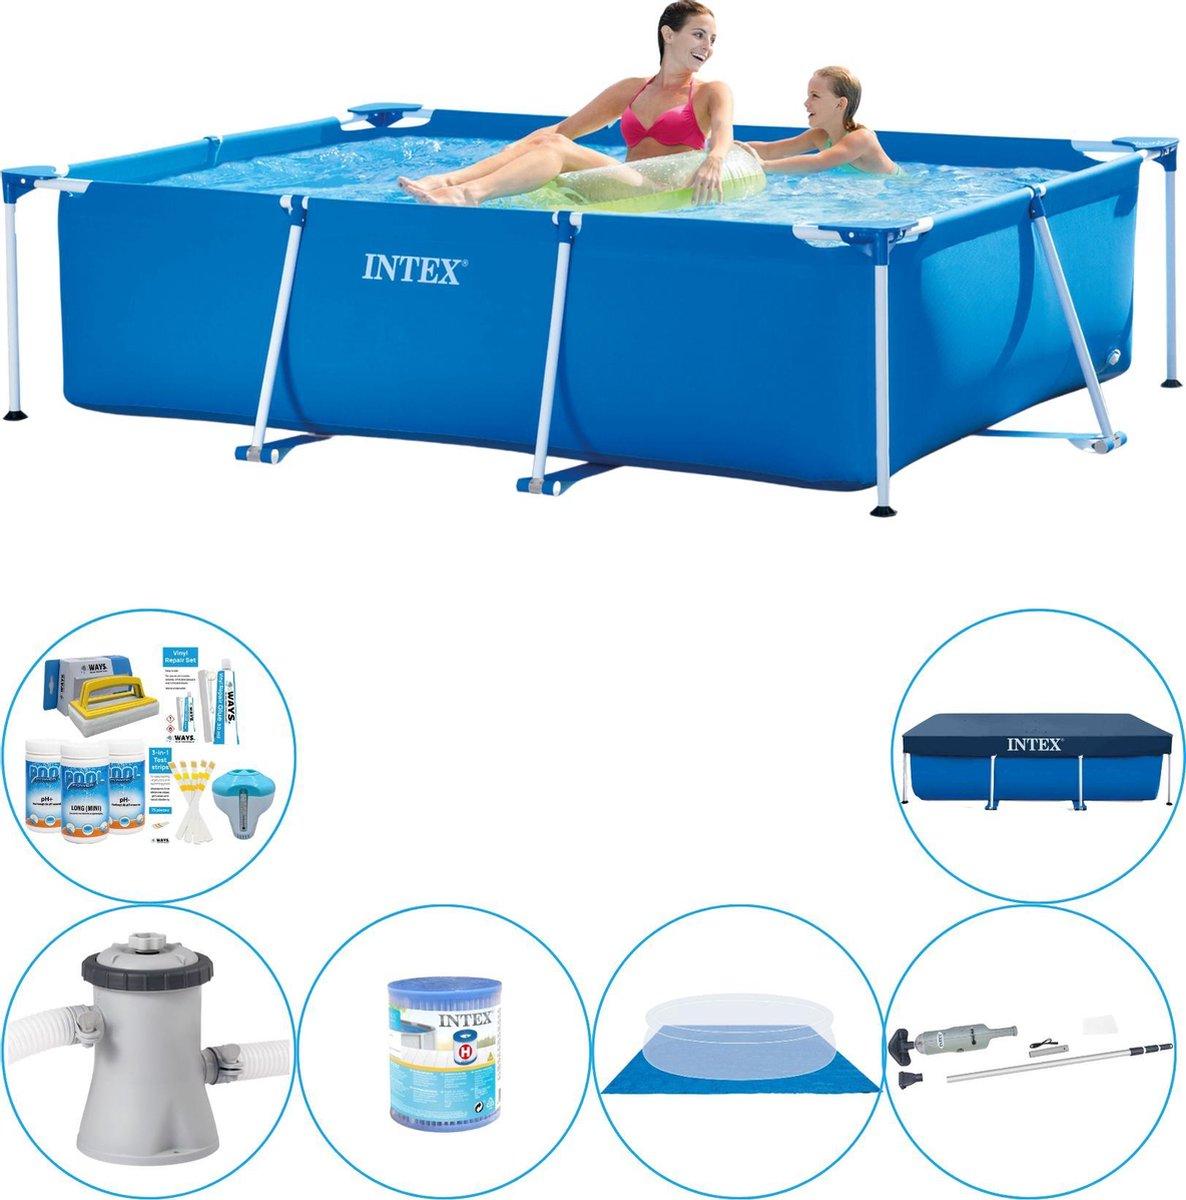 Intex Frame Pool Rechthoekig 220x150x60 cm - Zwembad Inclusief Accessoires